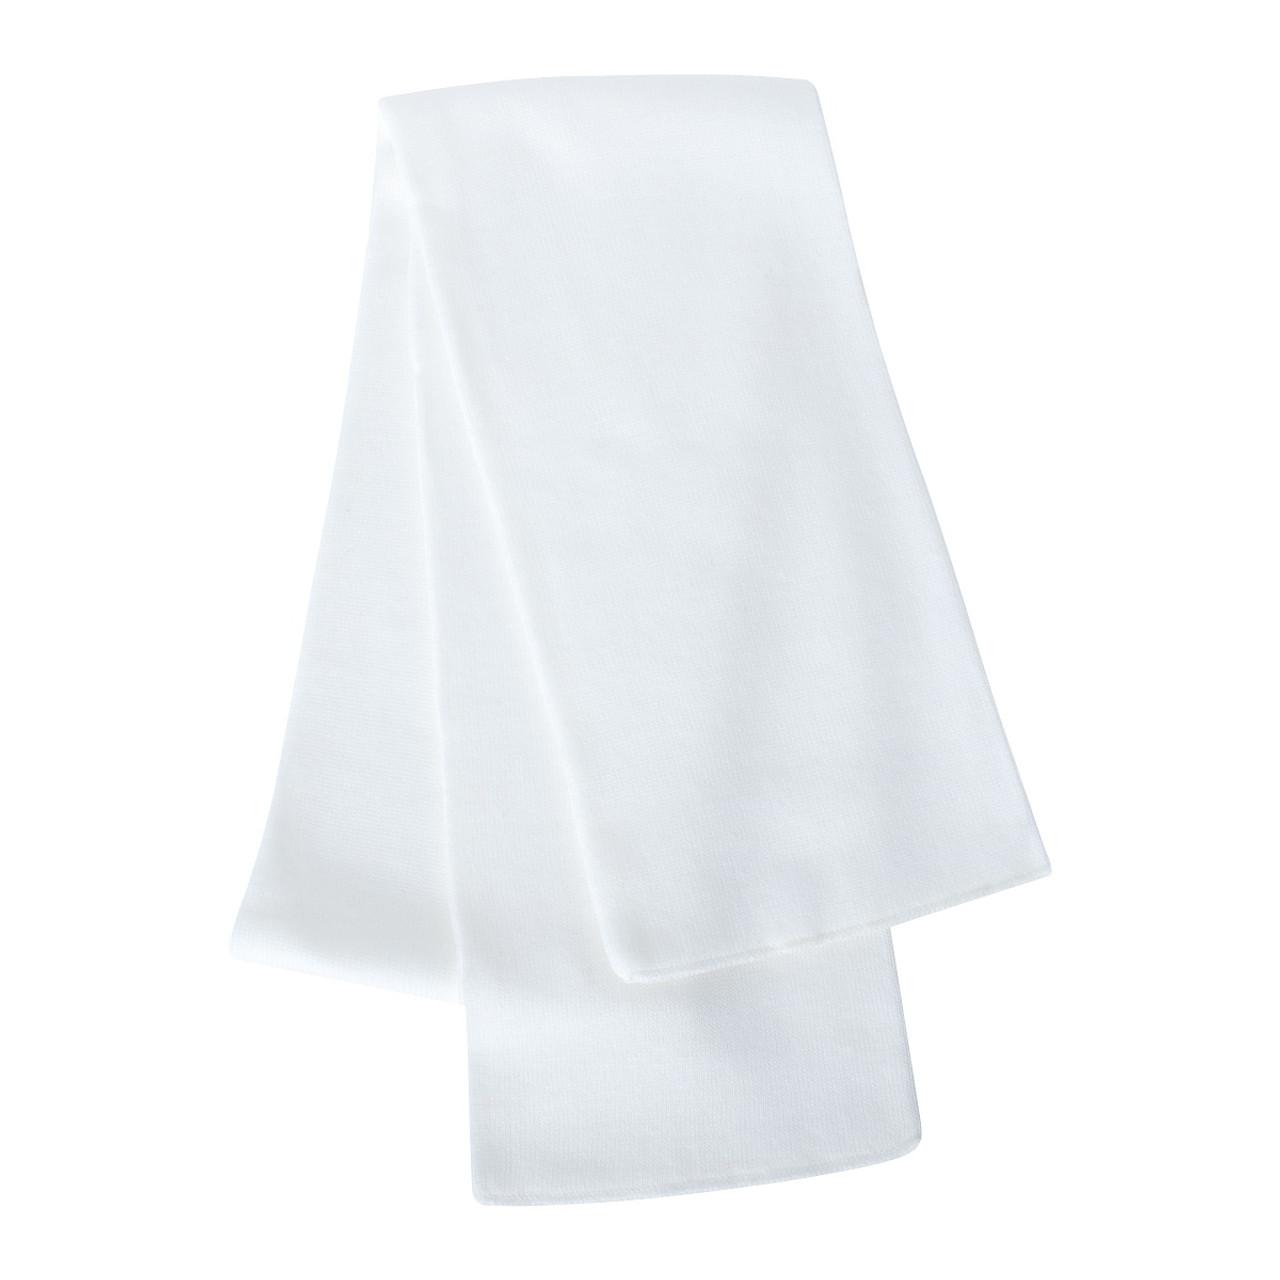 White - SP04 Sportsman Knit Scarf | T-shirt.ca